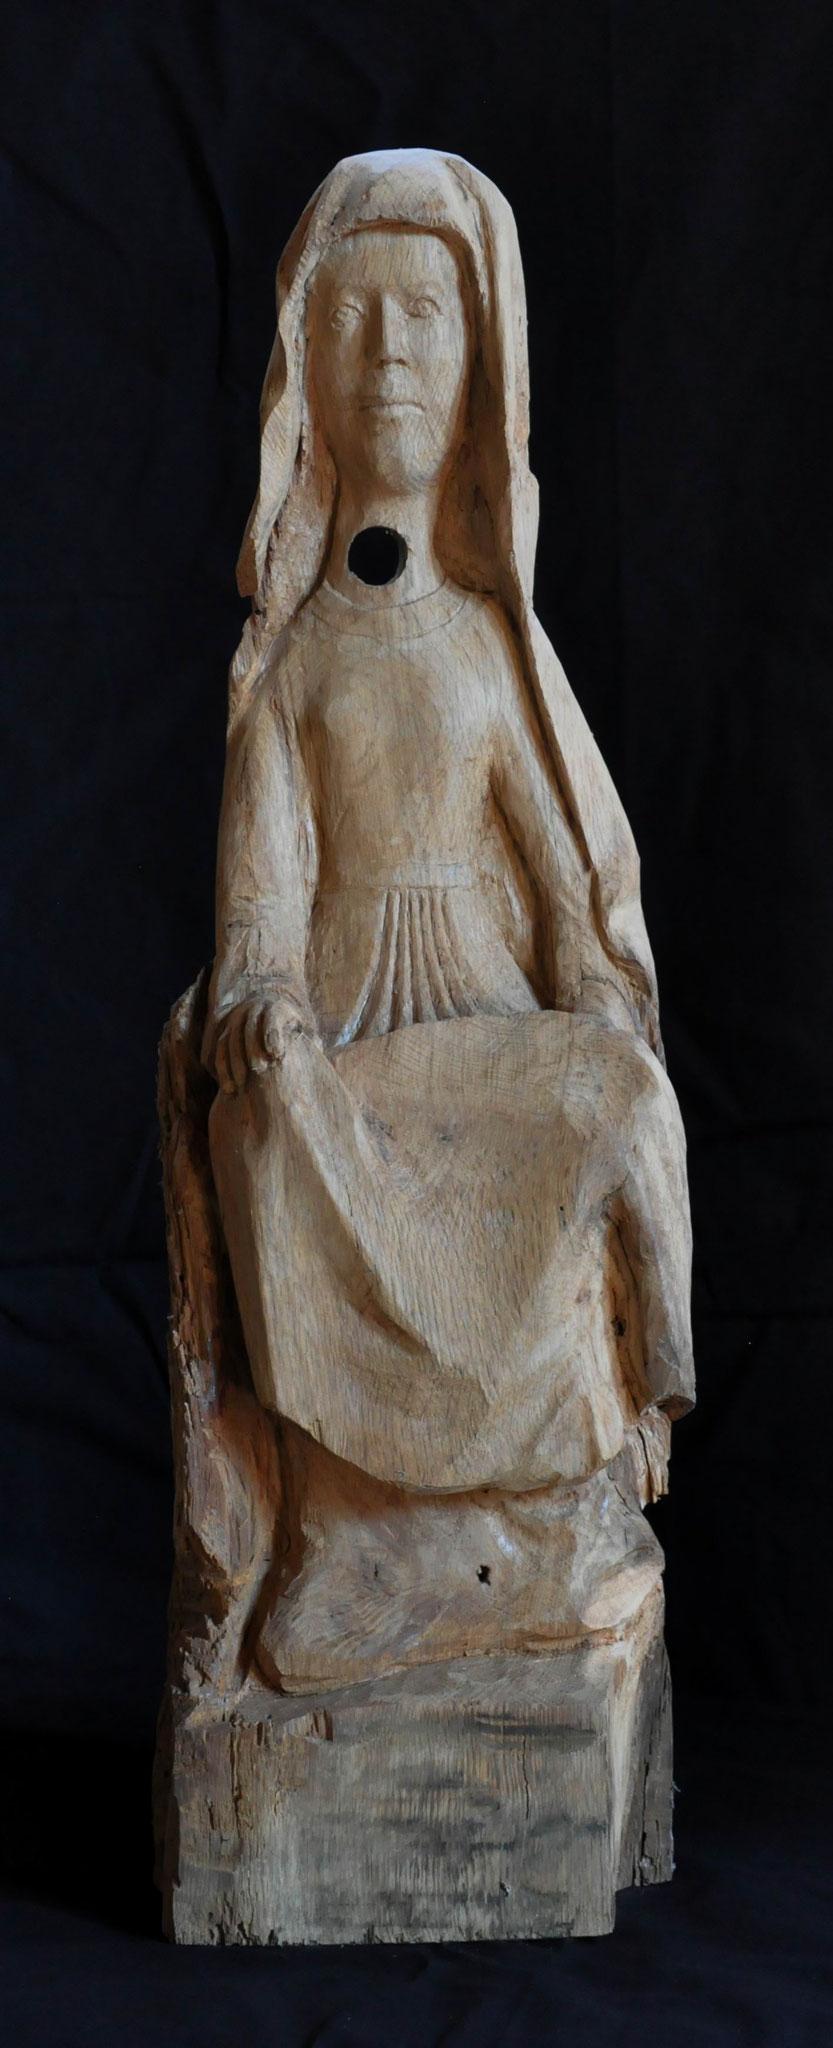 VERONIKA  (Eiche  72 x 21 x 13 cm)